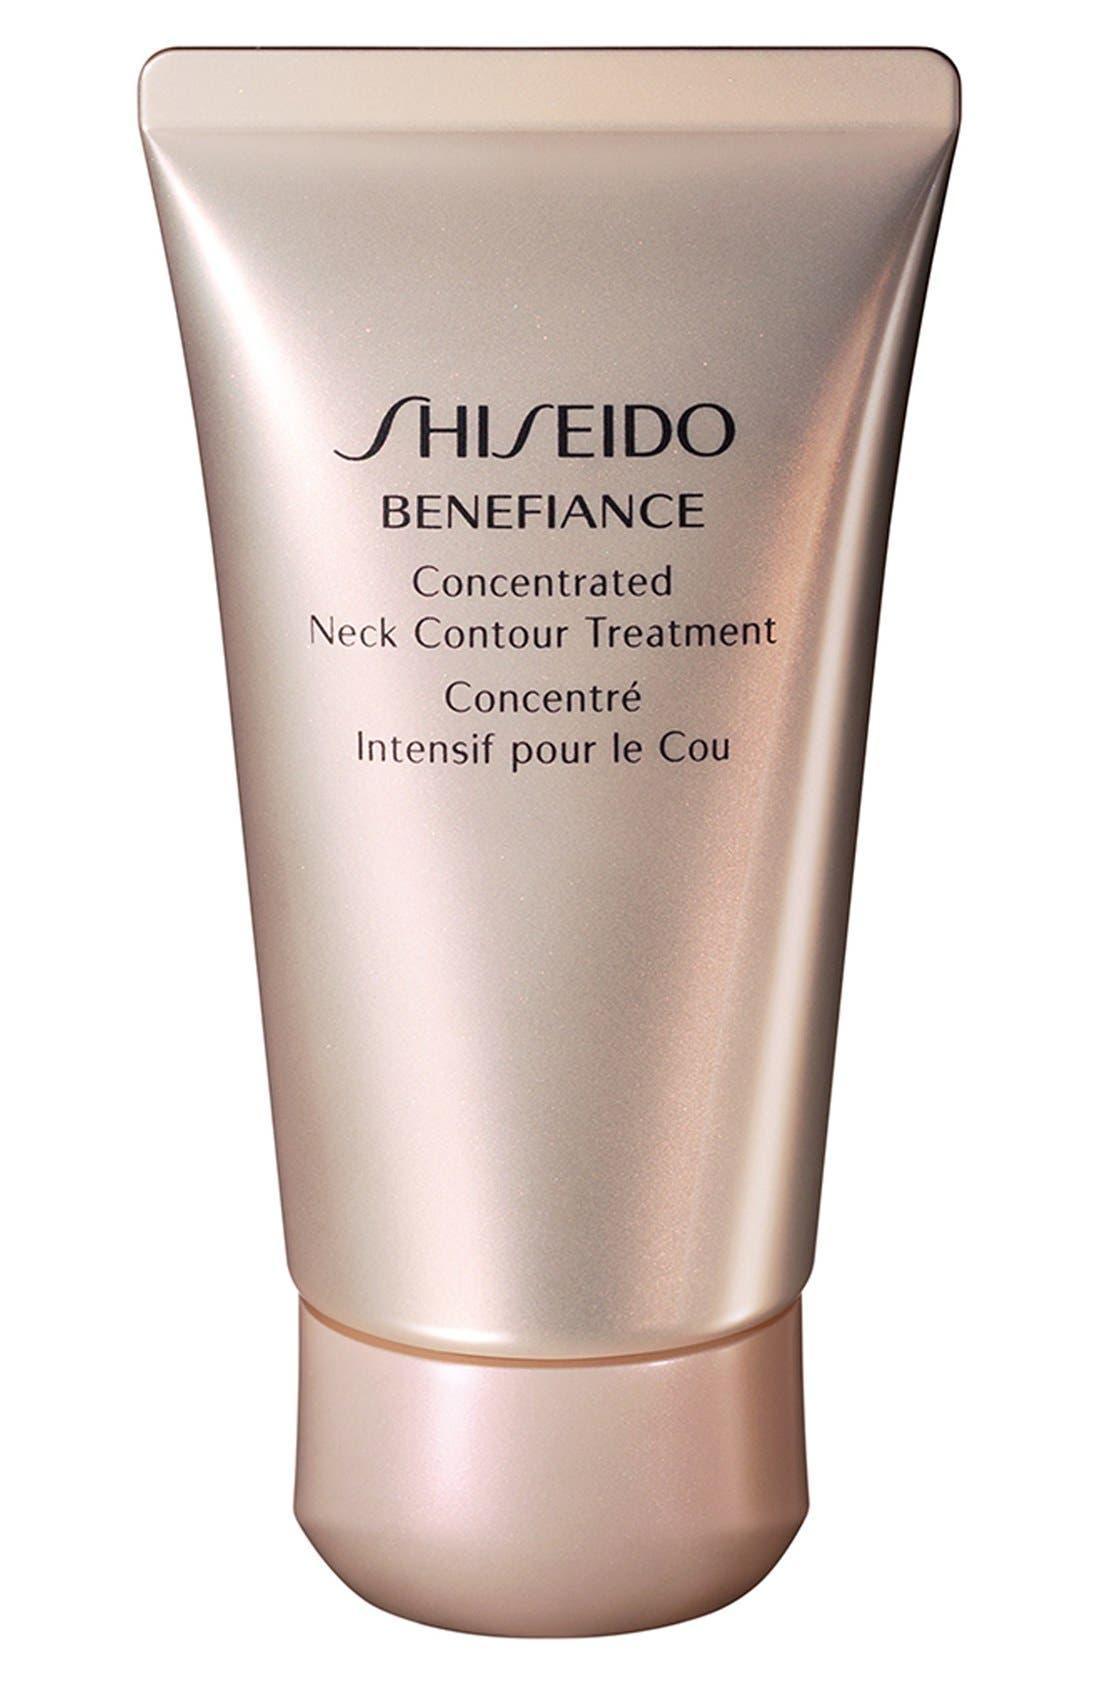 Benefiance Concentrated Neck Contour Treatment